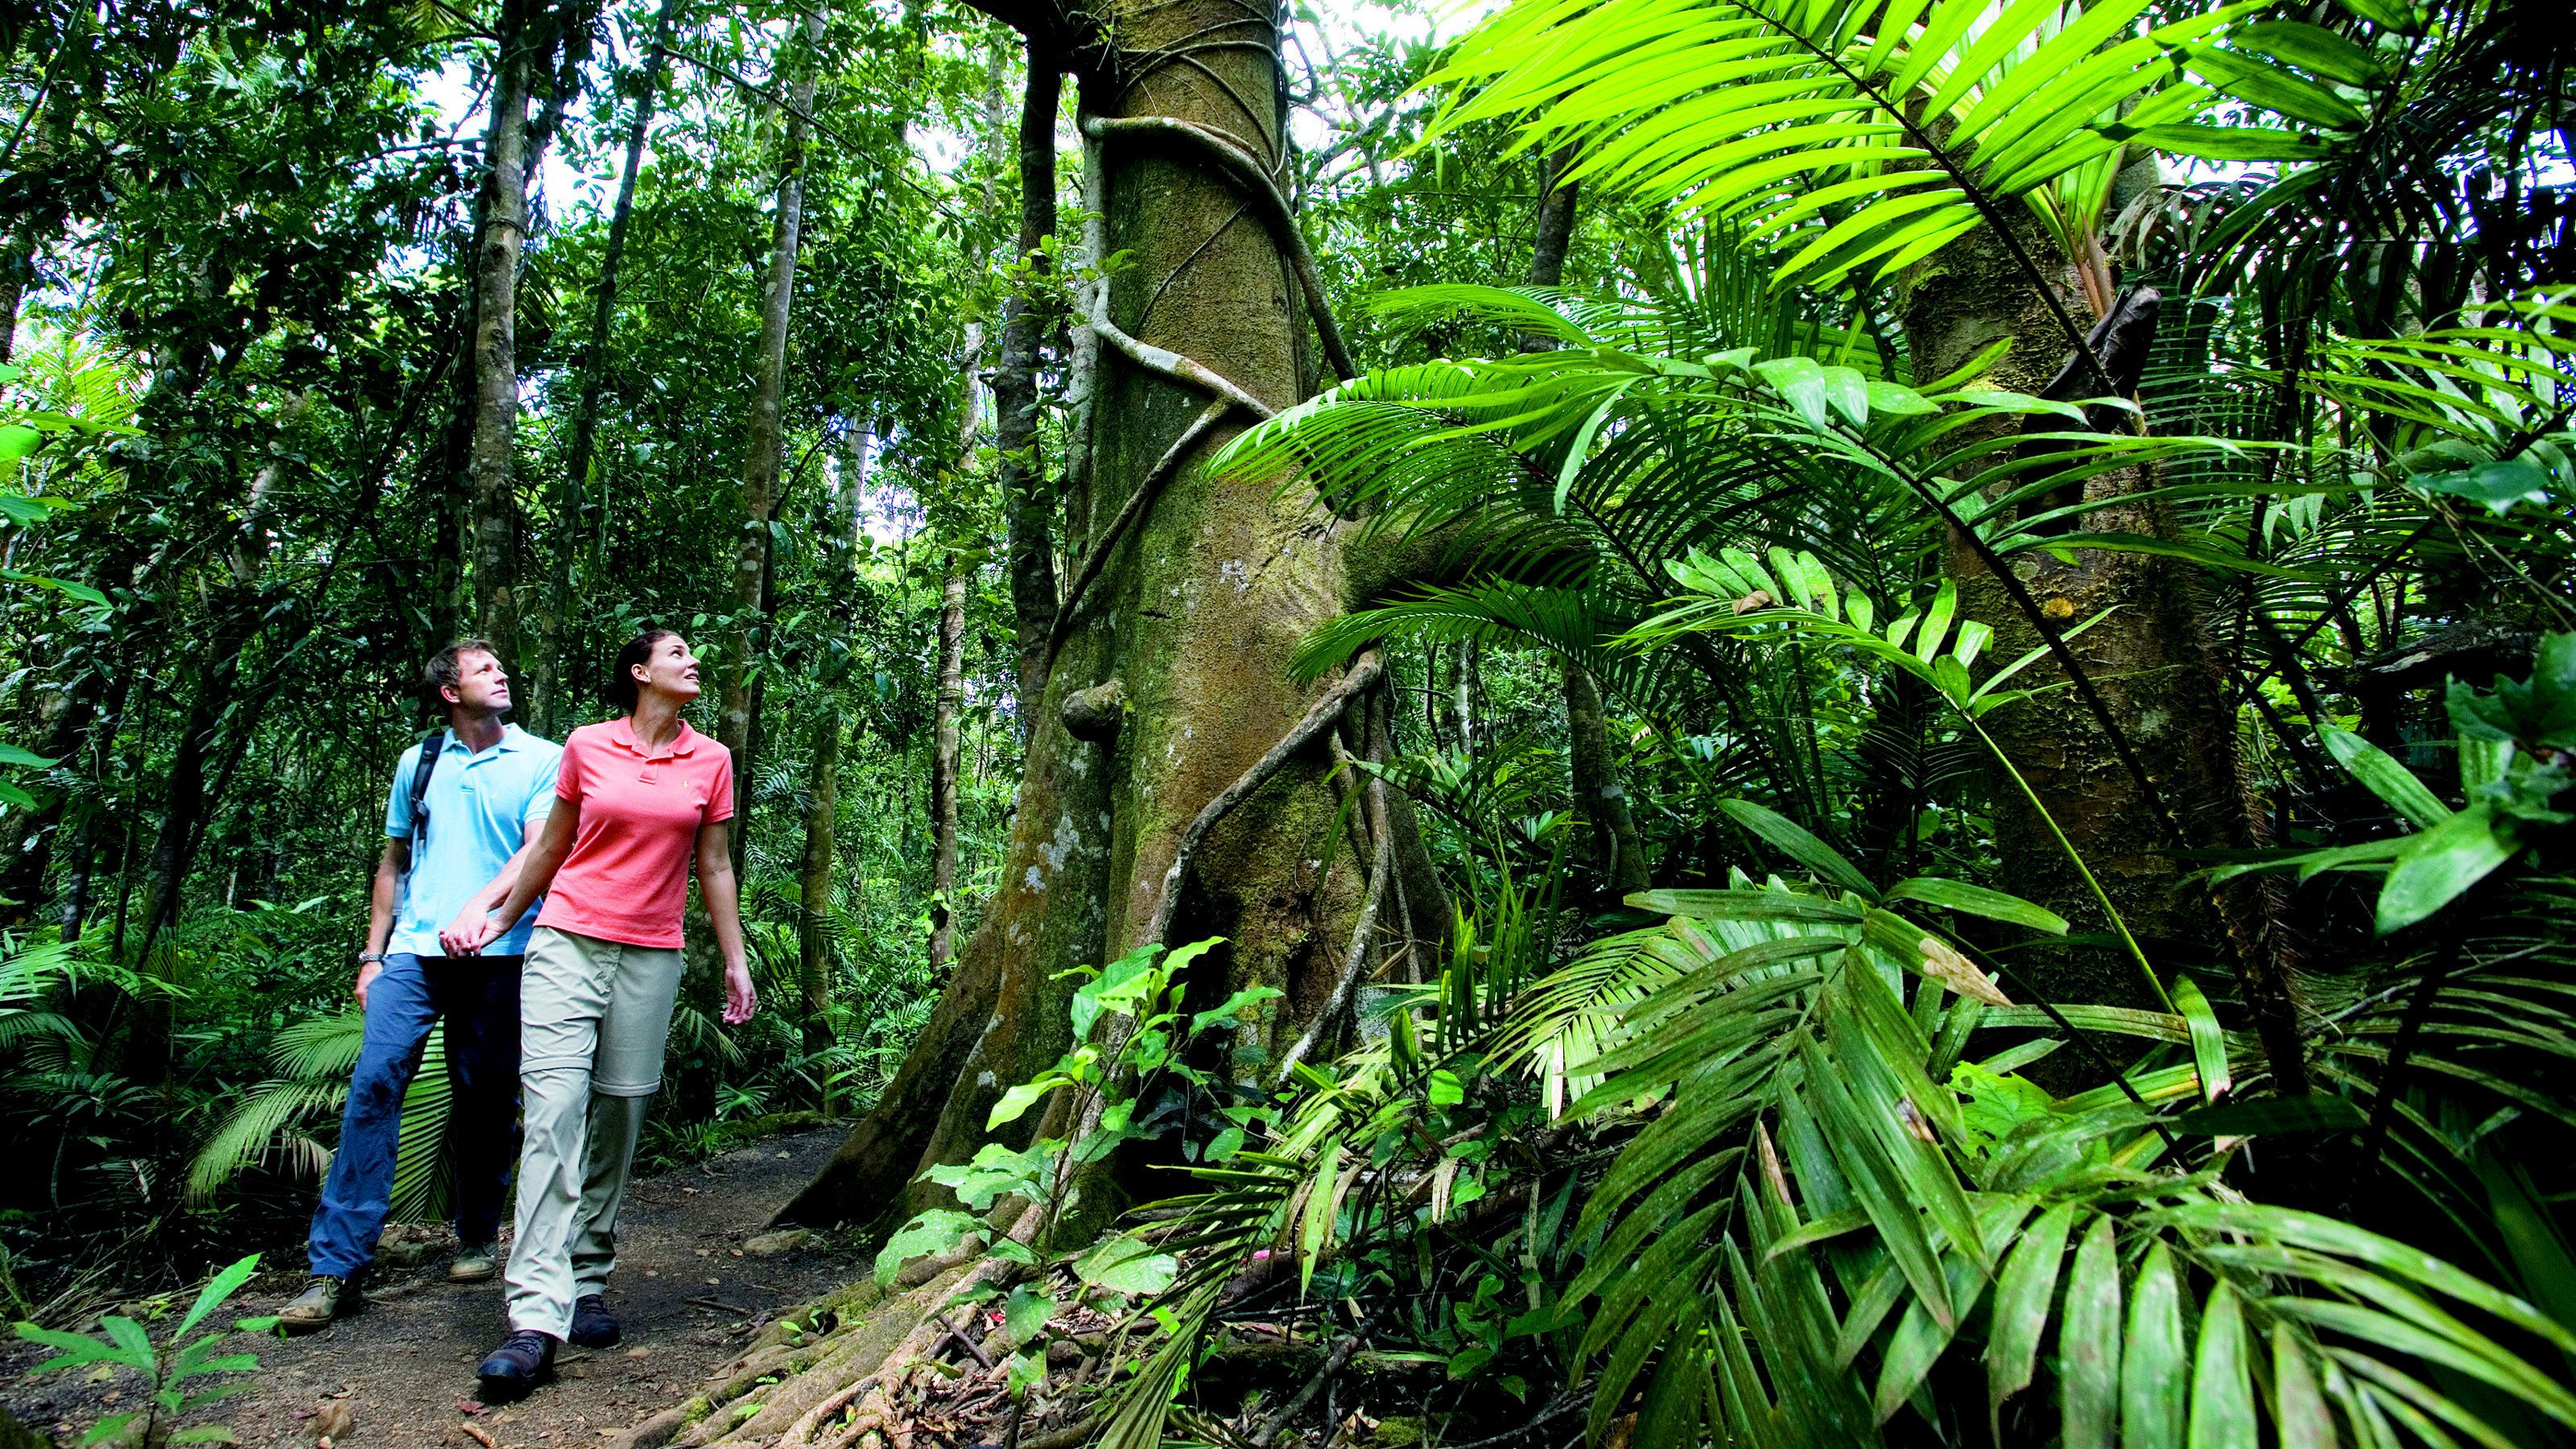 Cape Tribulation & Daintree Rainforest